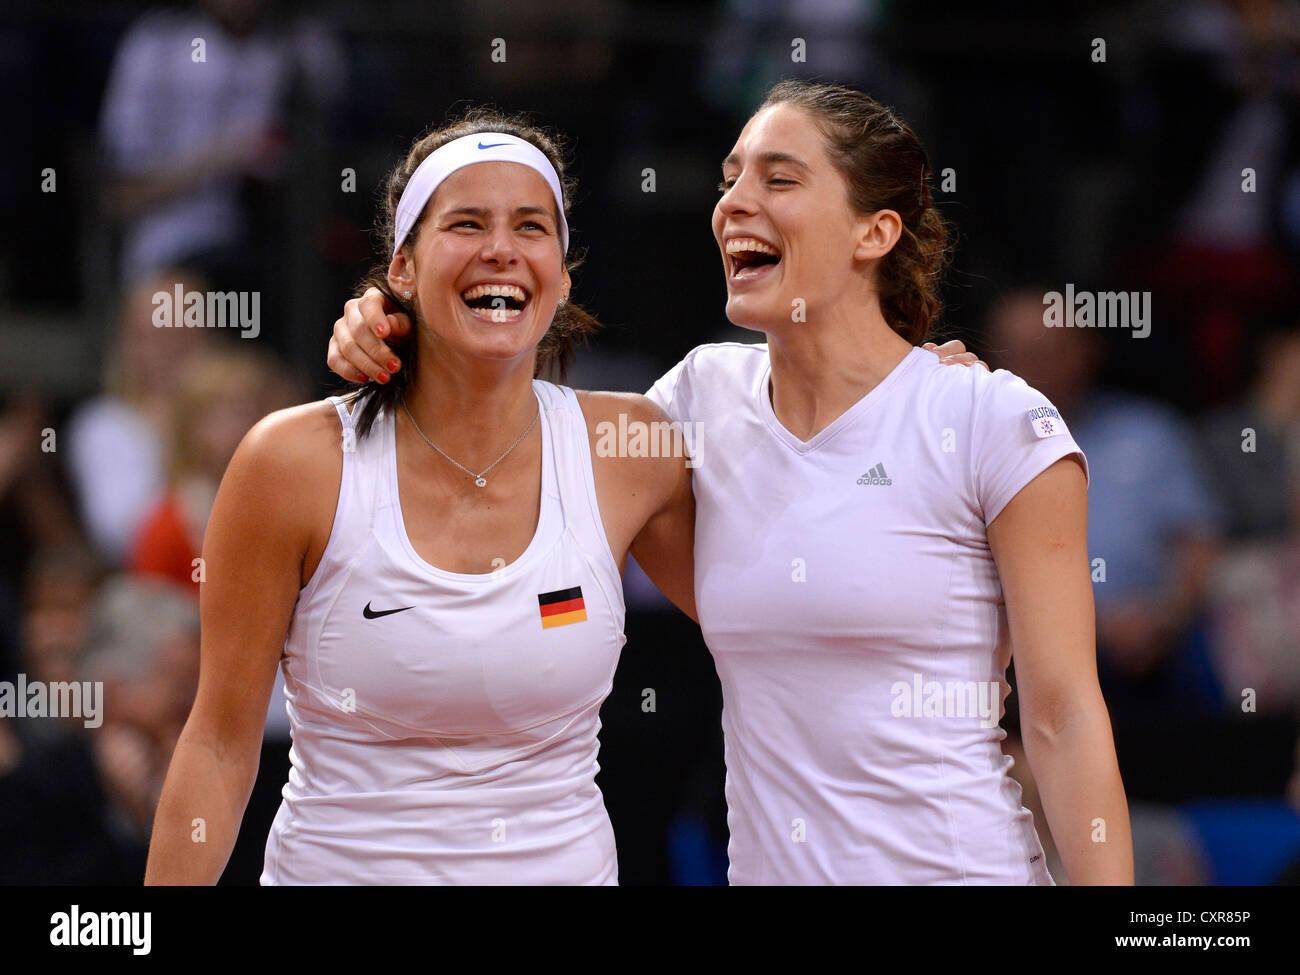 Julia Goerges Und Andrea Petkovic Ger Damen Tennis Doppel Fedcup